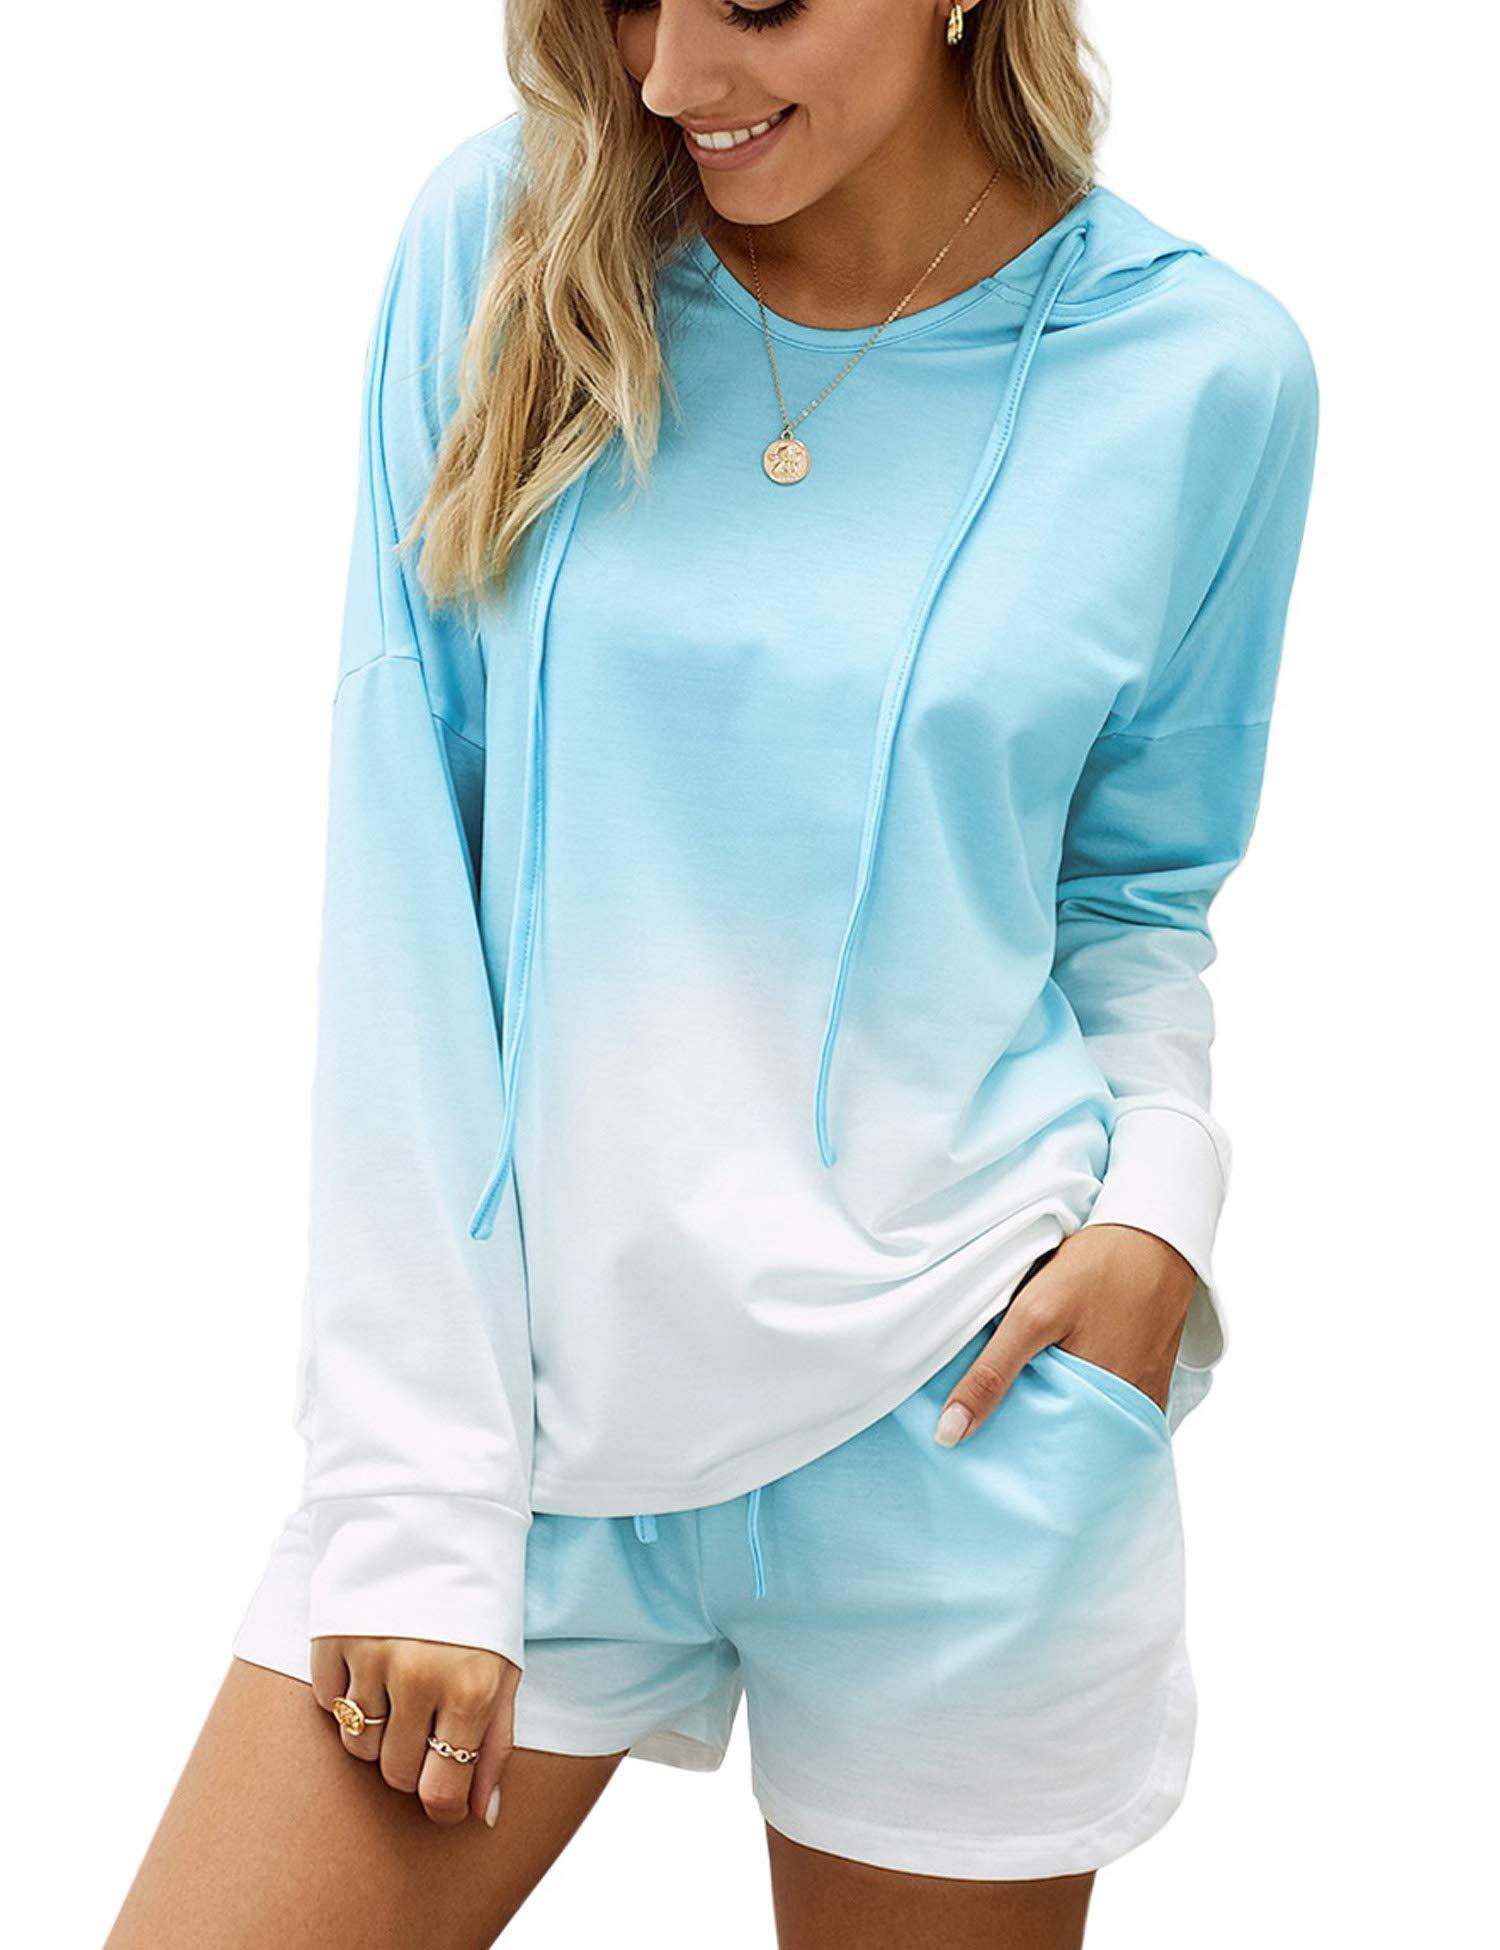 ANGABRIEL Womens Tie-dye Pajamas Set Long Sleeve Hoodie with Shorts PJ Set